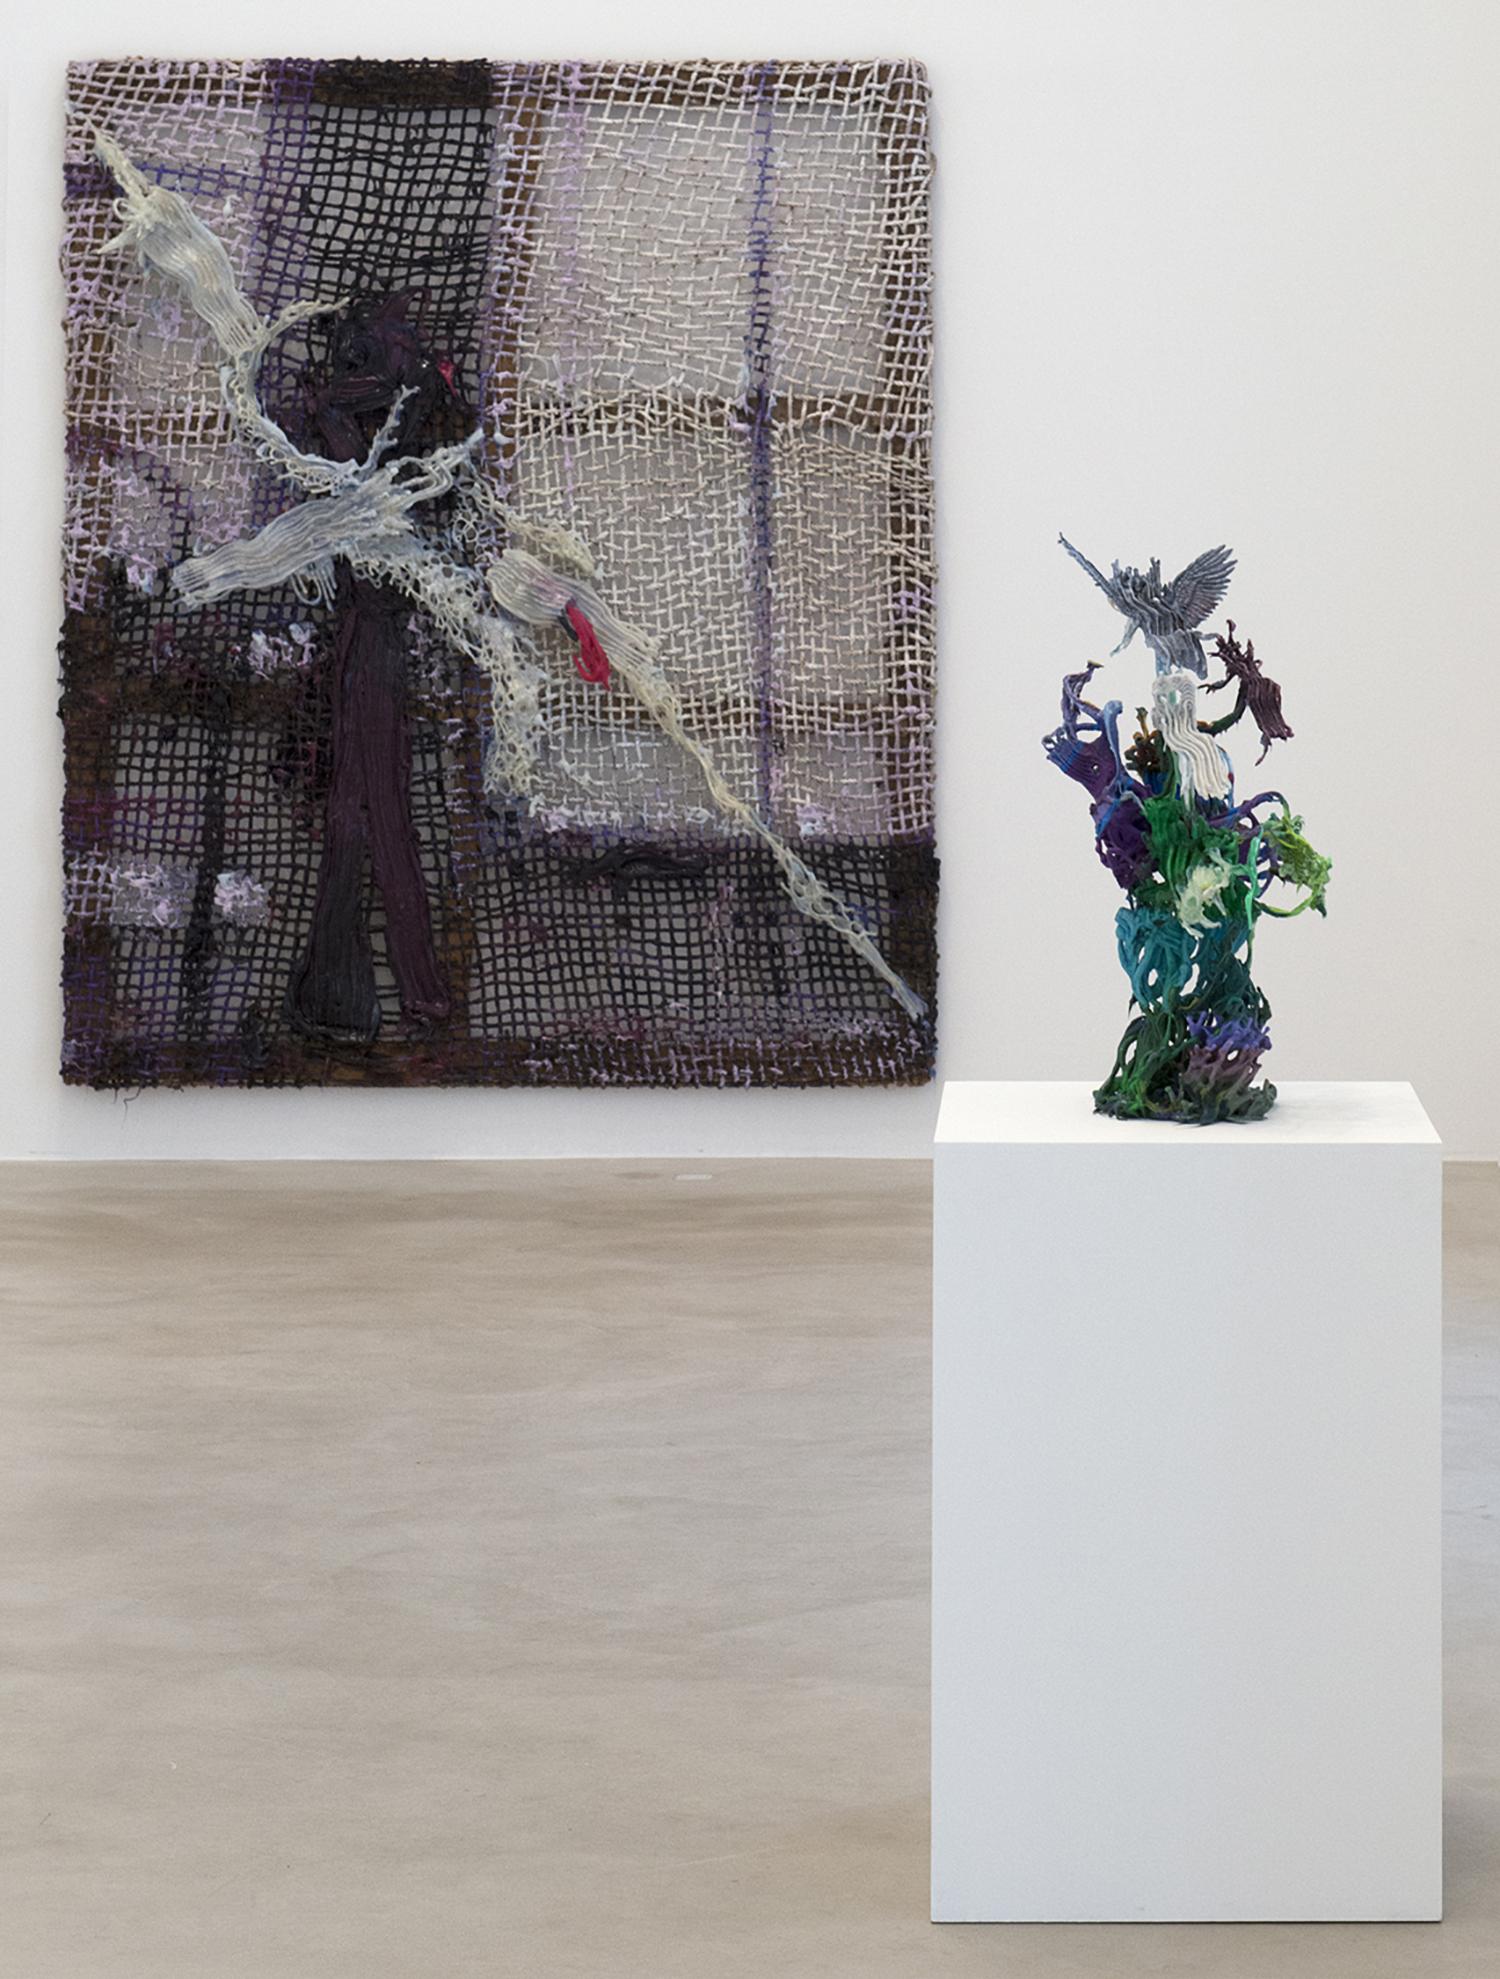 """Fabian Marcaccio: Engineered Paintants,"" Makasiini Contemporary, Turku, Finland 2017"